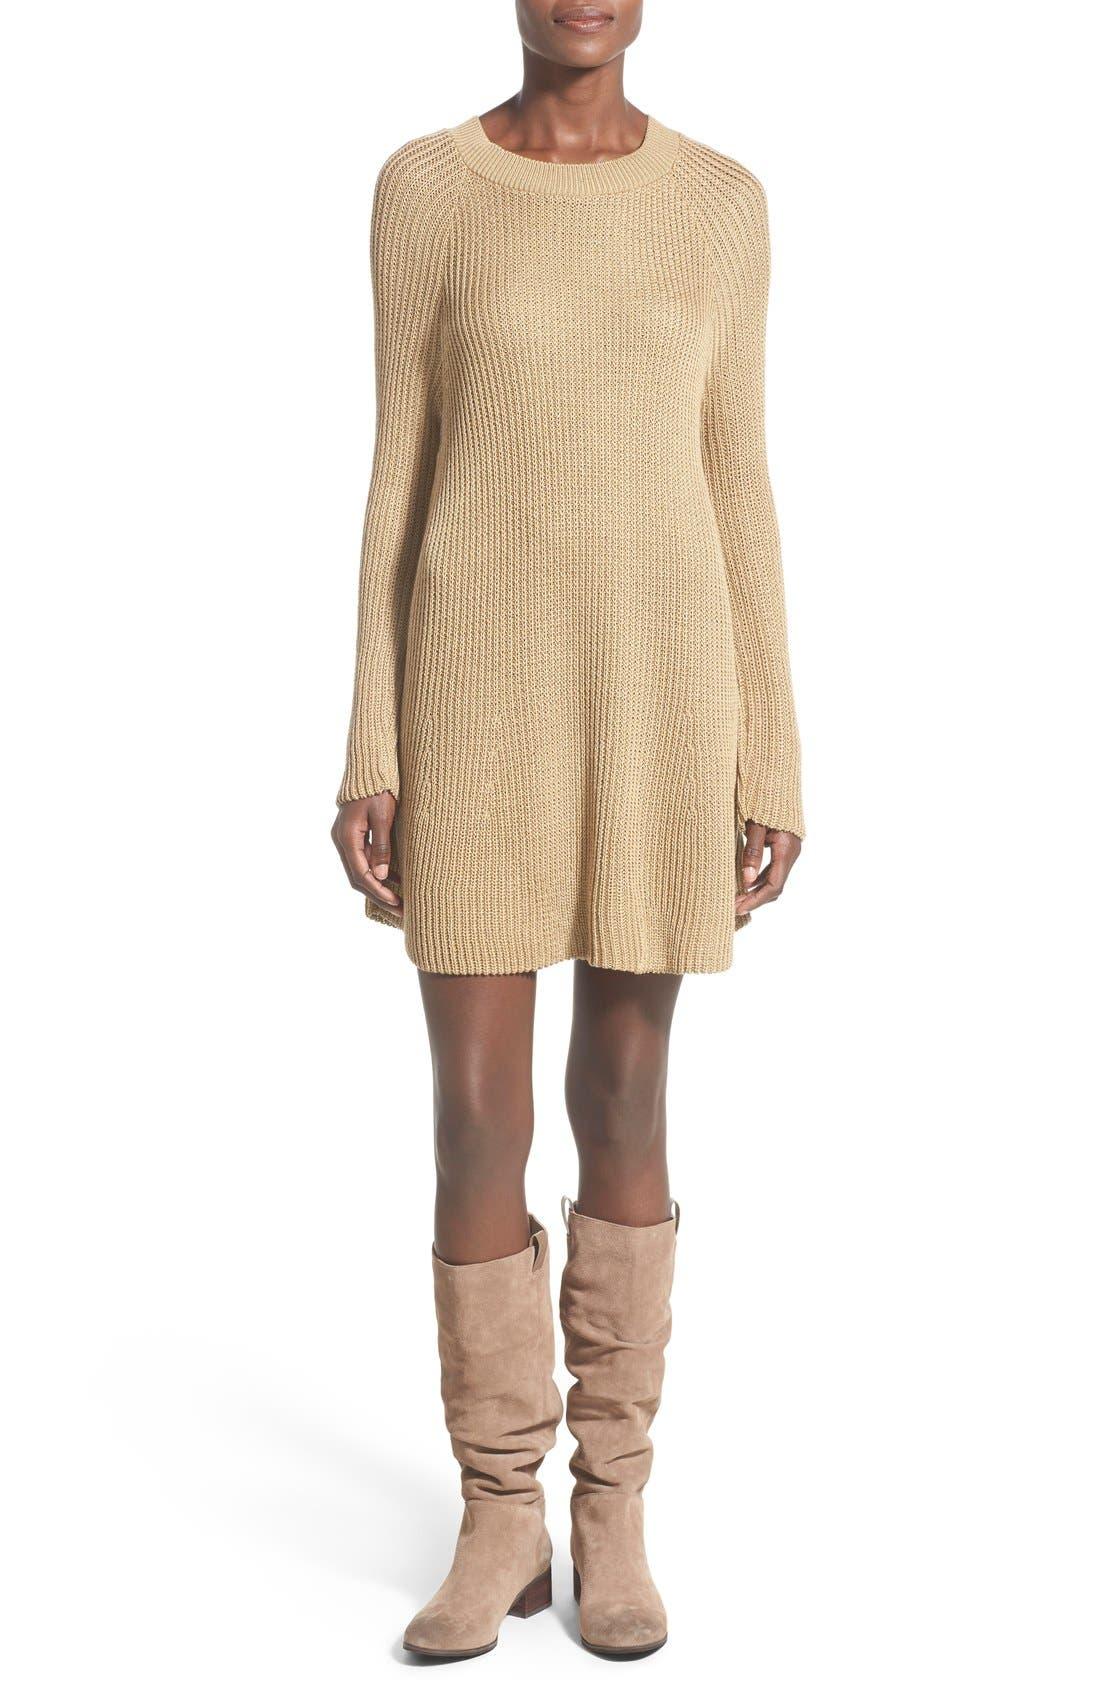 Alternate Image 1 Selected - Cotton Emporium Crewneck Sweater Dress